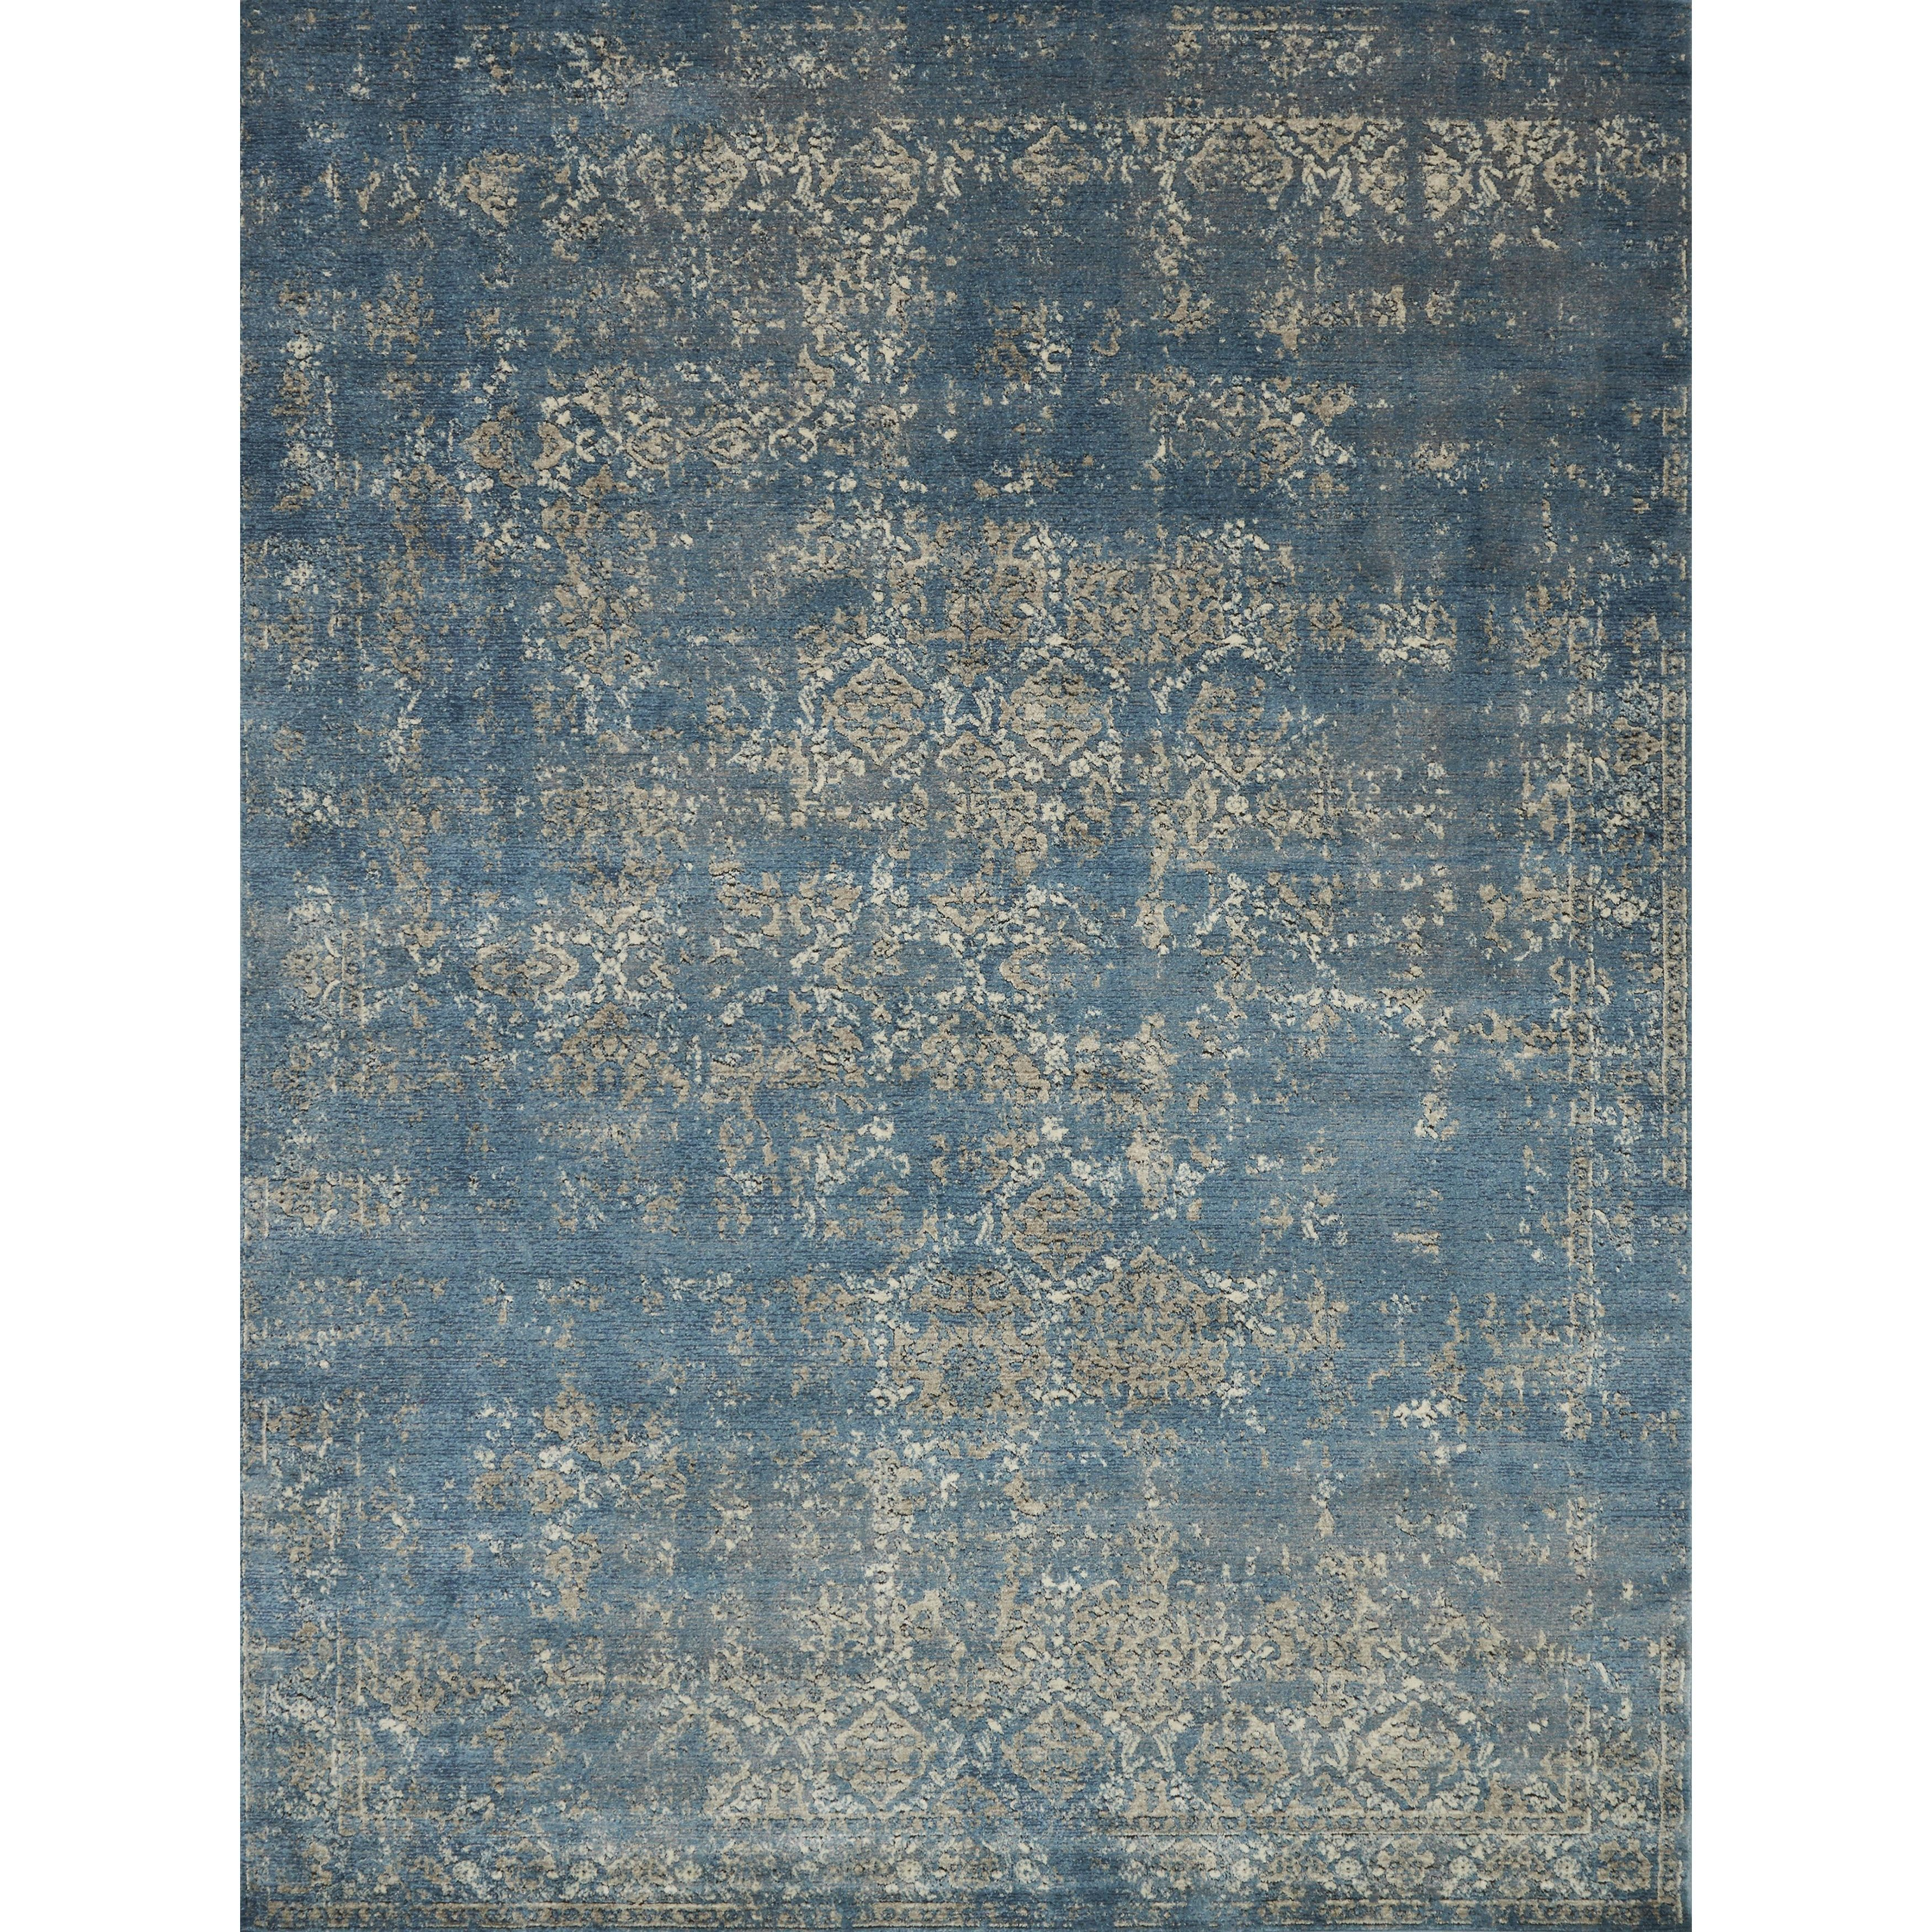 alexander home antique inspired vintage blue taupe distressed rug